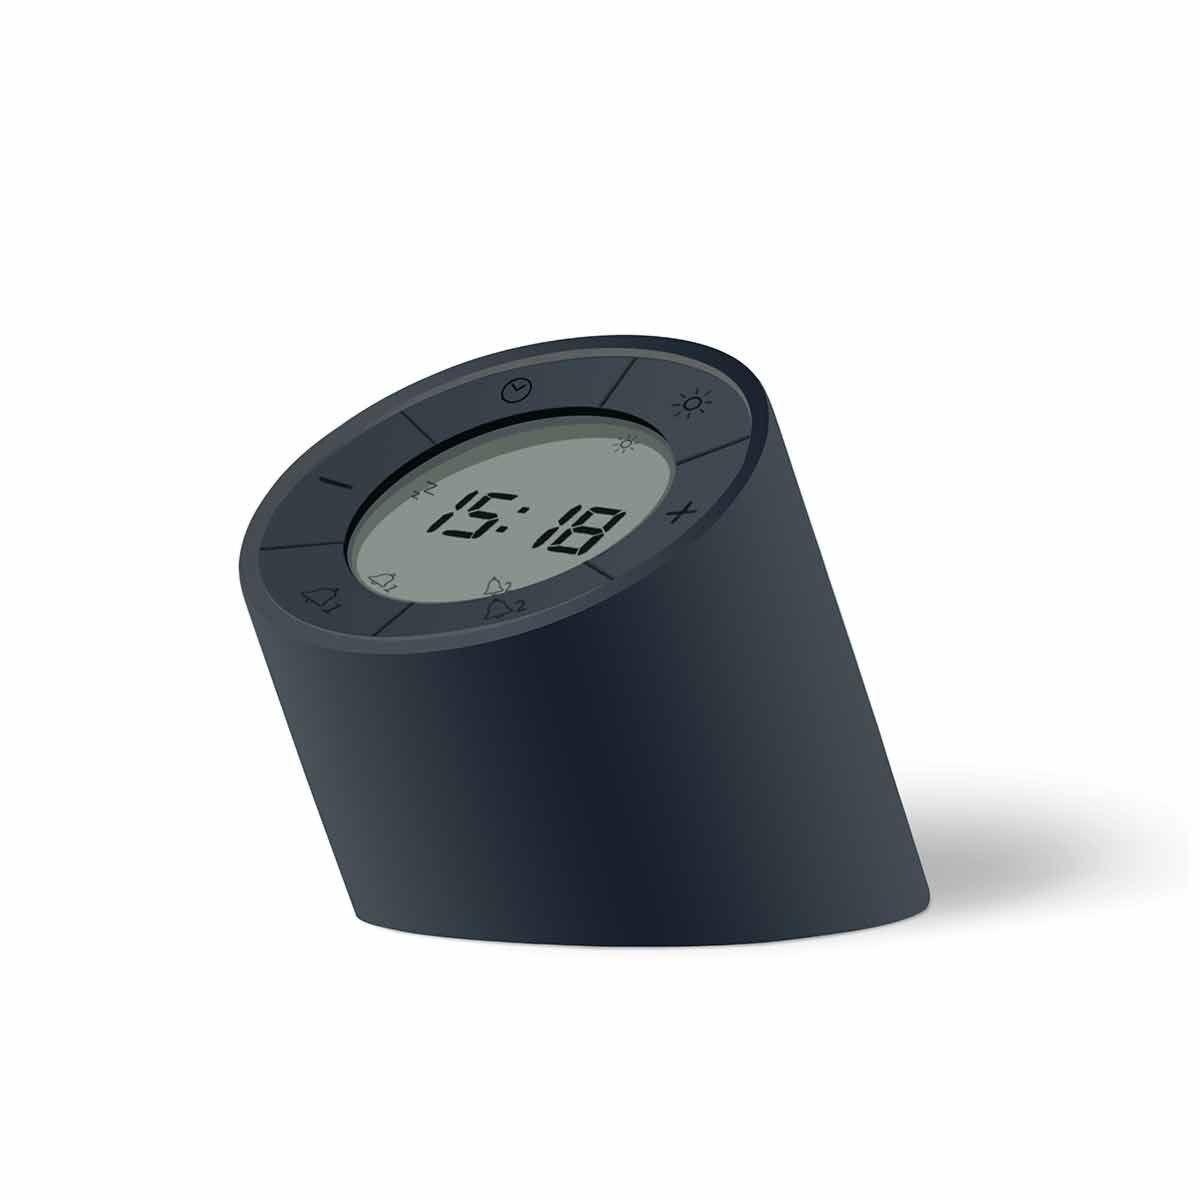 Gingko Edge Light Alarm Clock Black